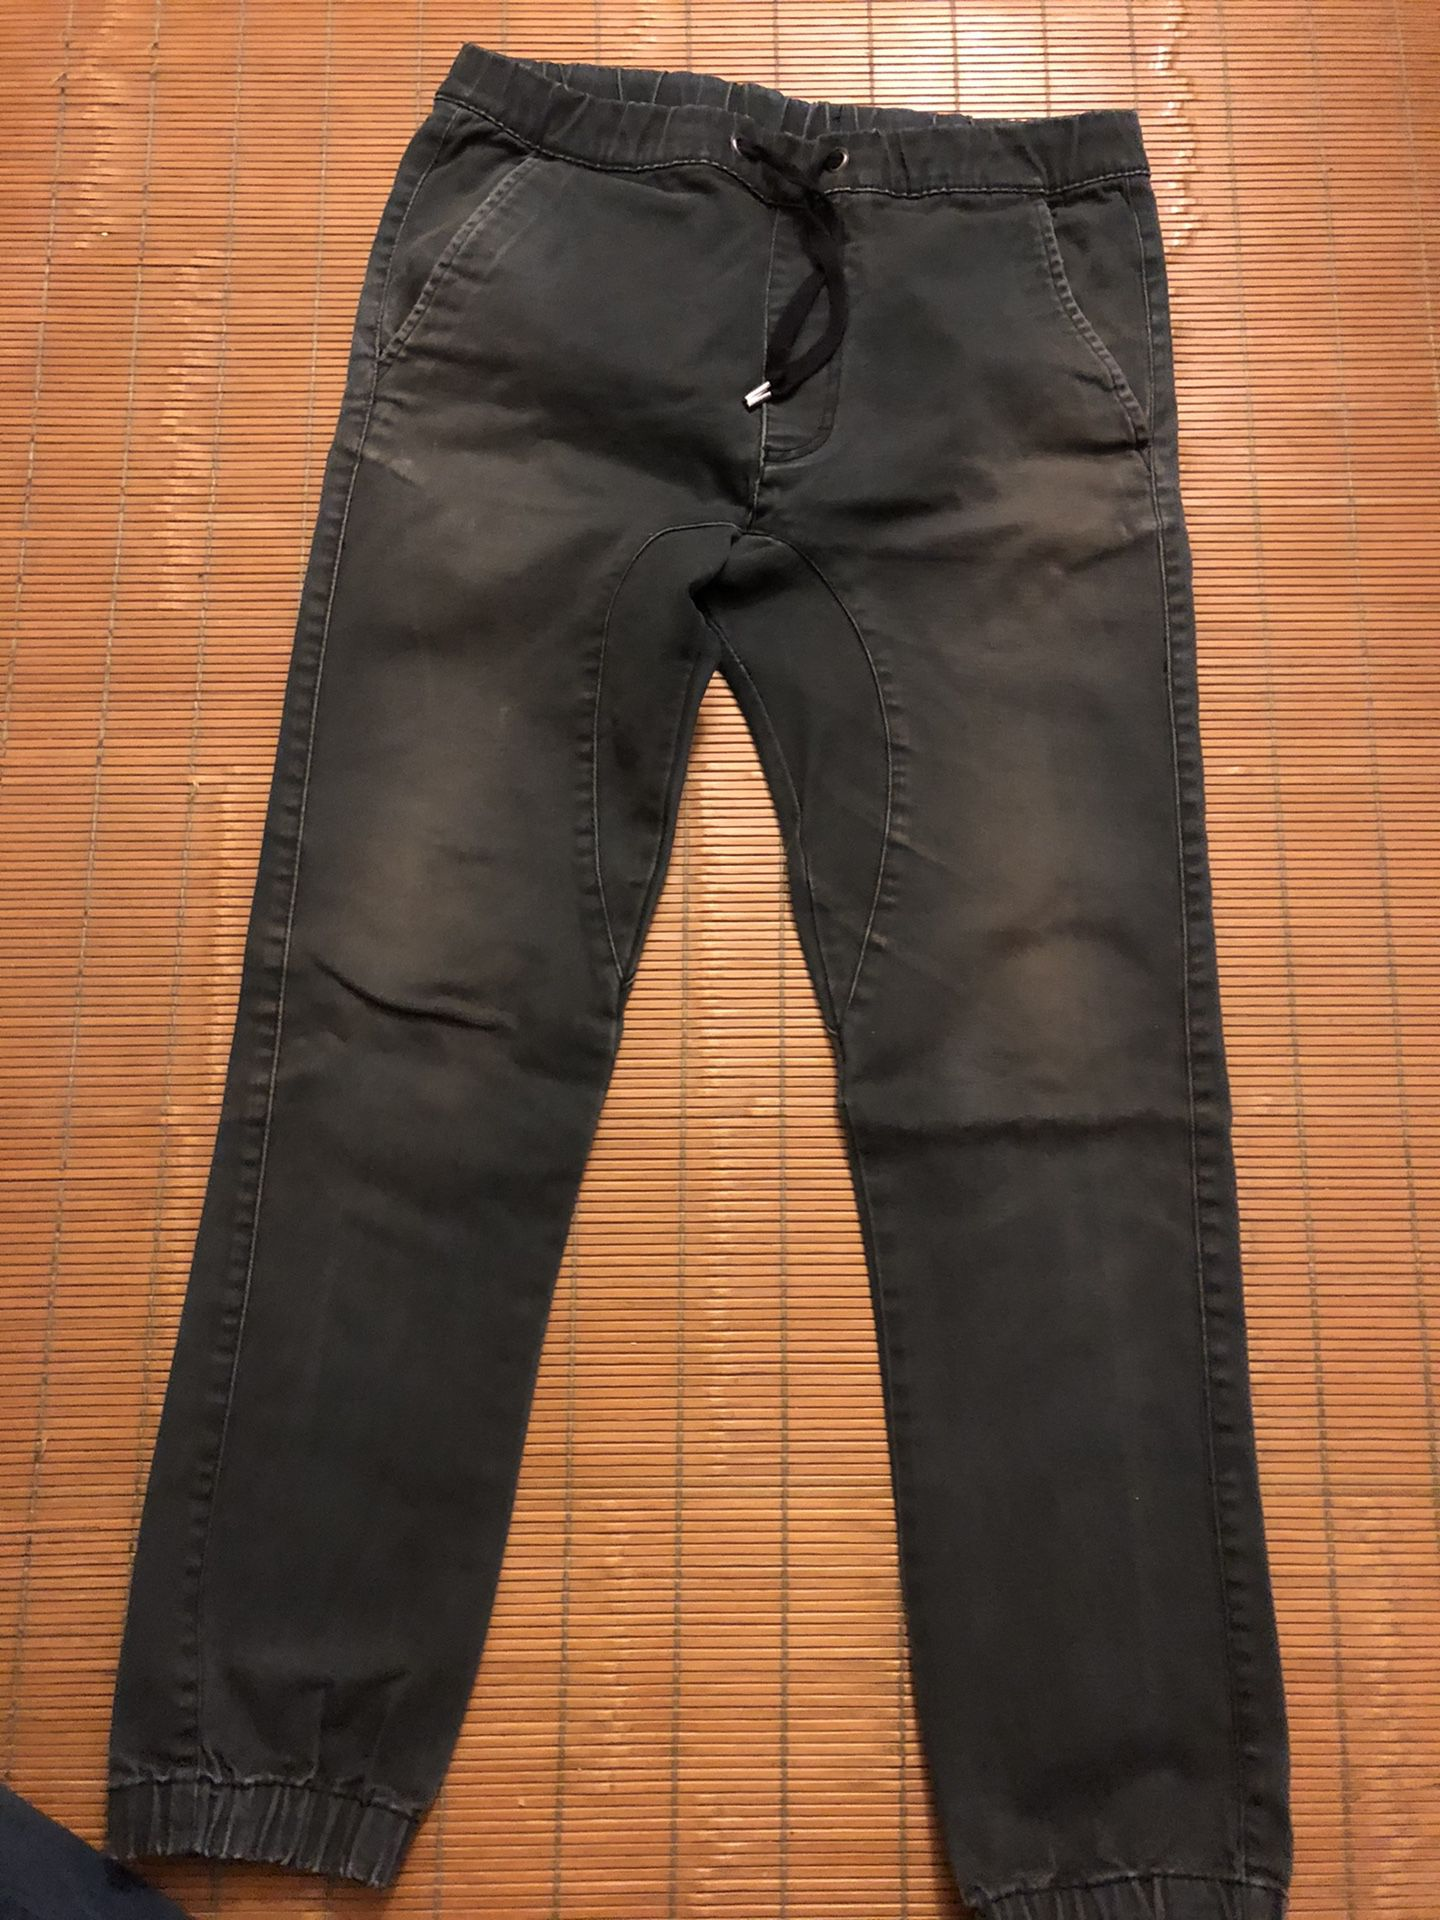 Black 30x30 Men's Pants